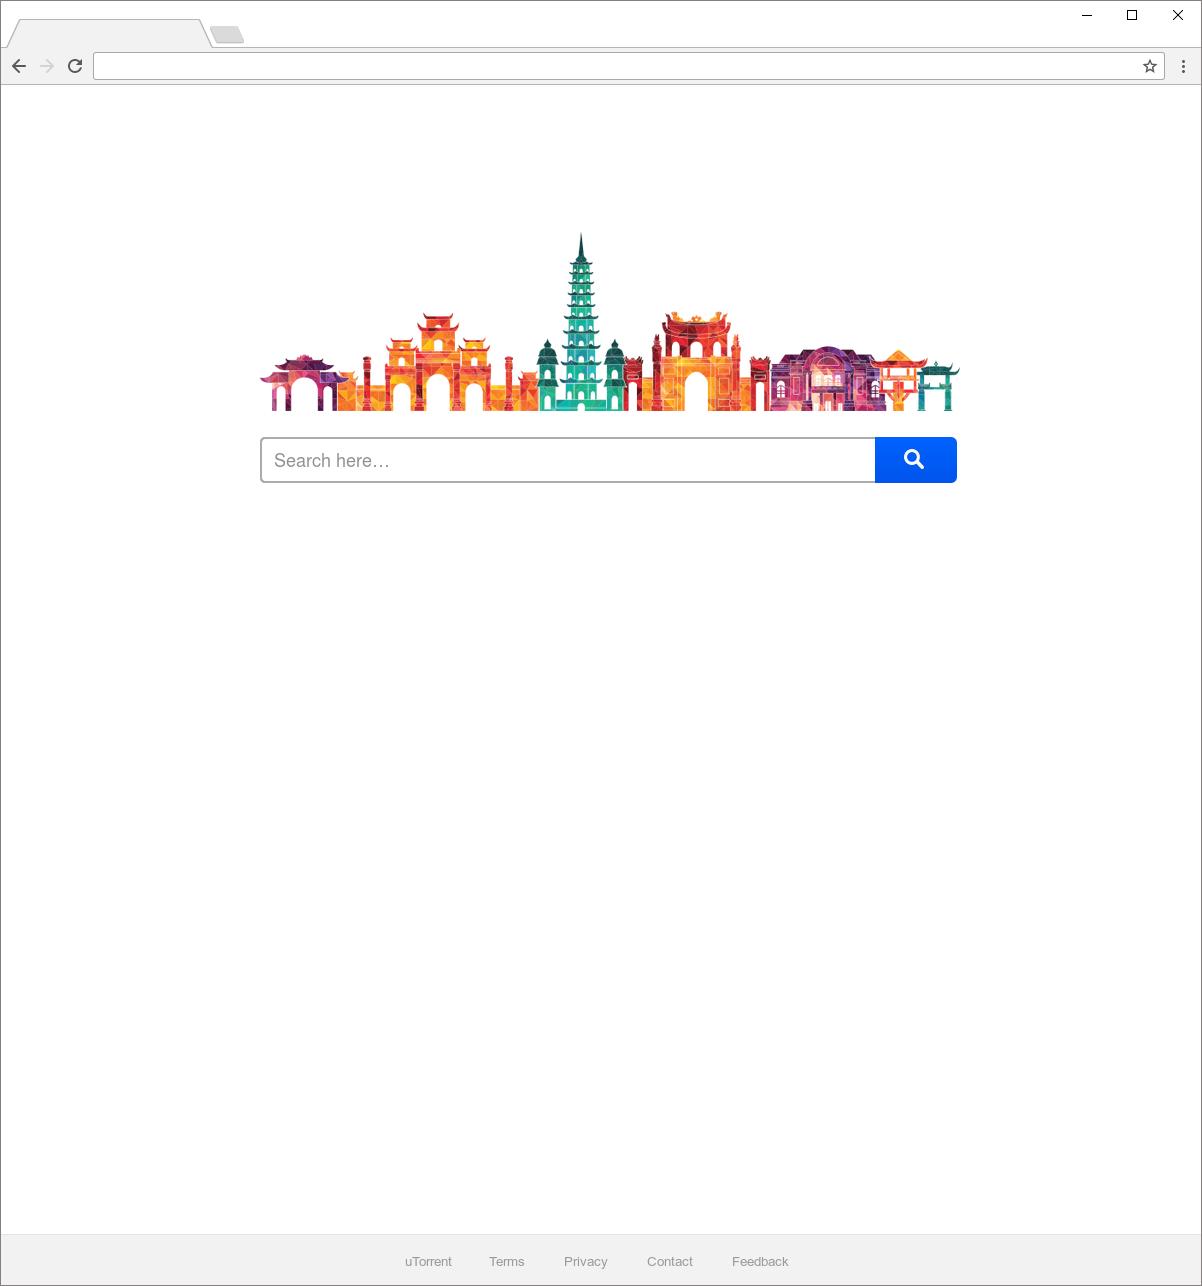 Search.searchutorr.com Hijacker